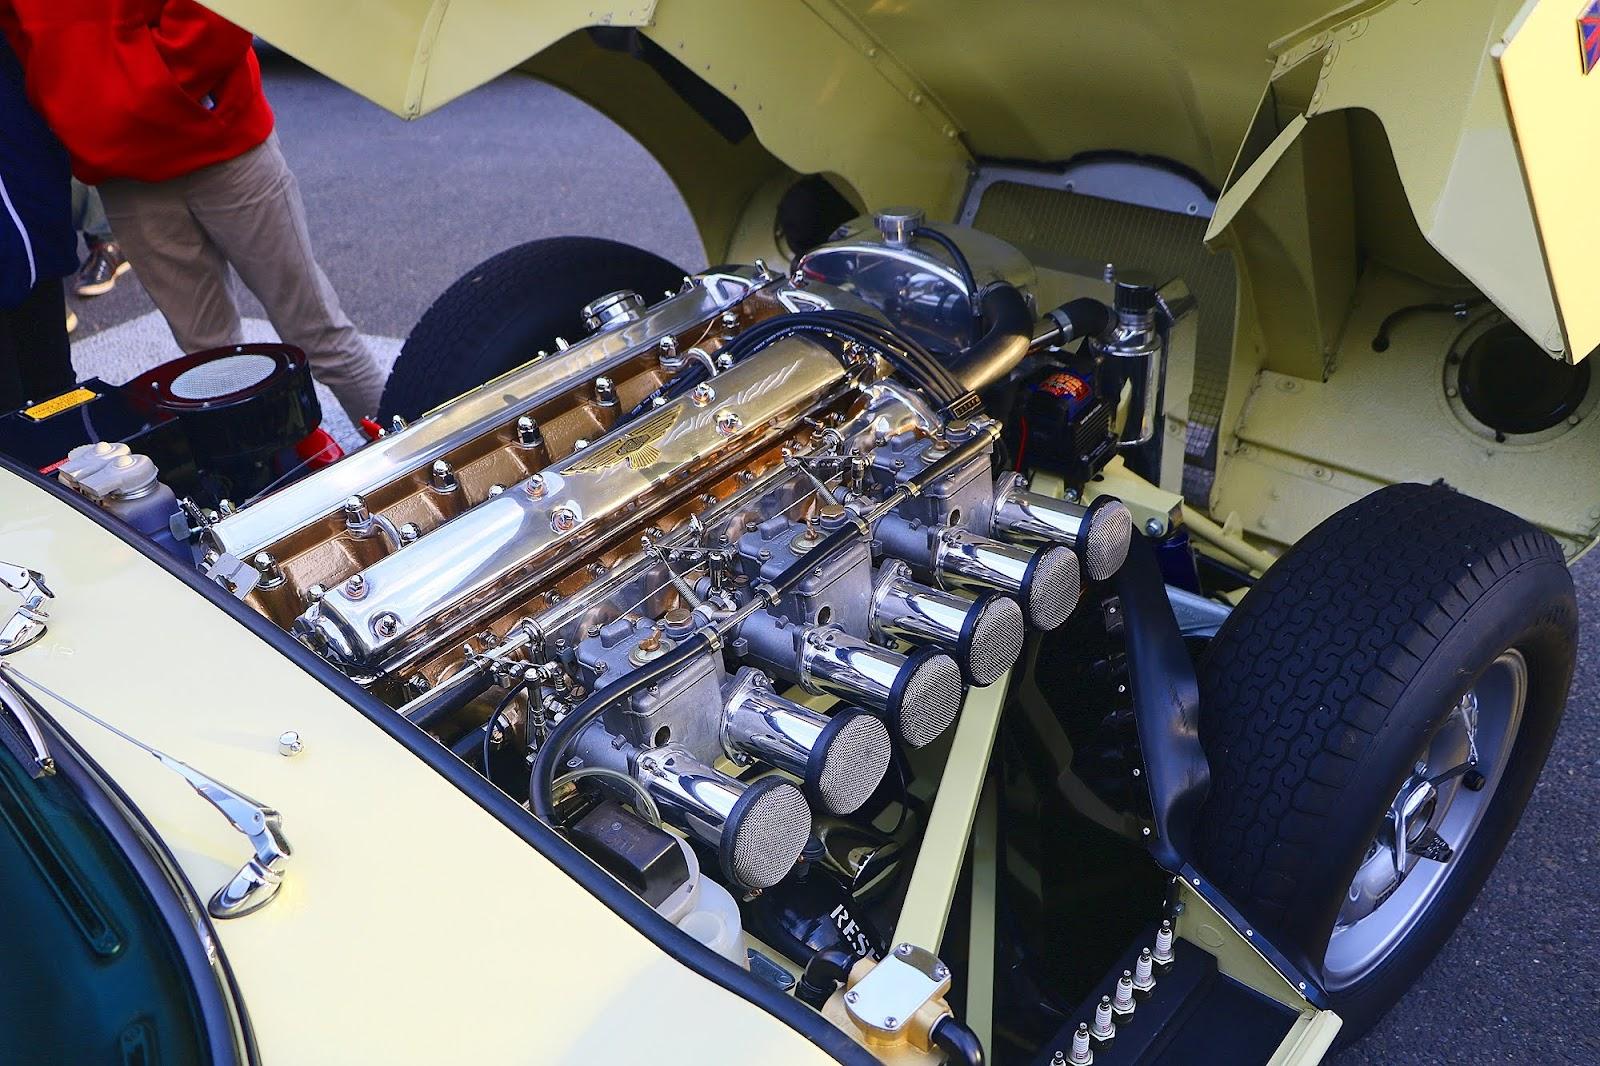 1964 Jaguar E-Type 3.8 Engine Bay 5.jpg